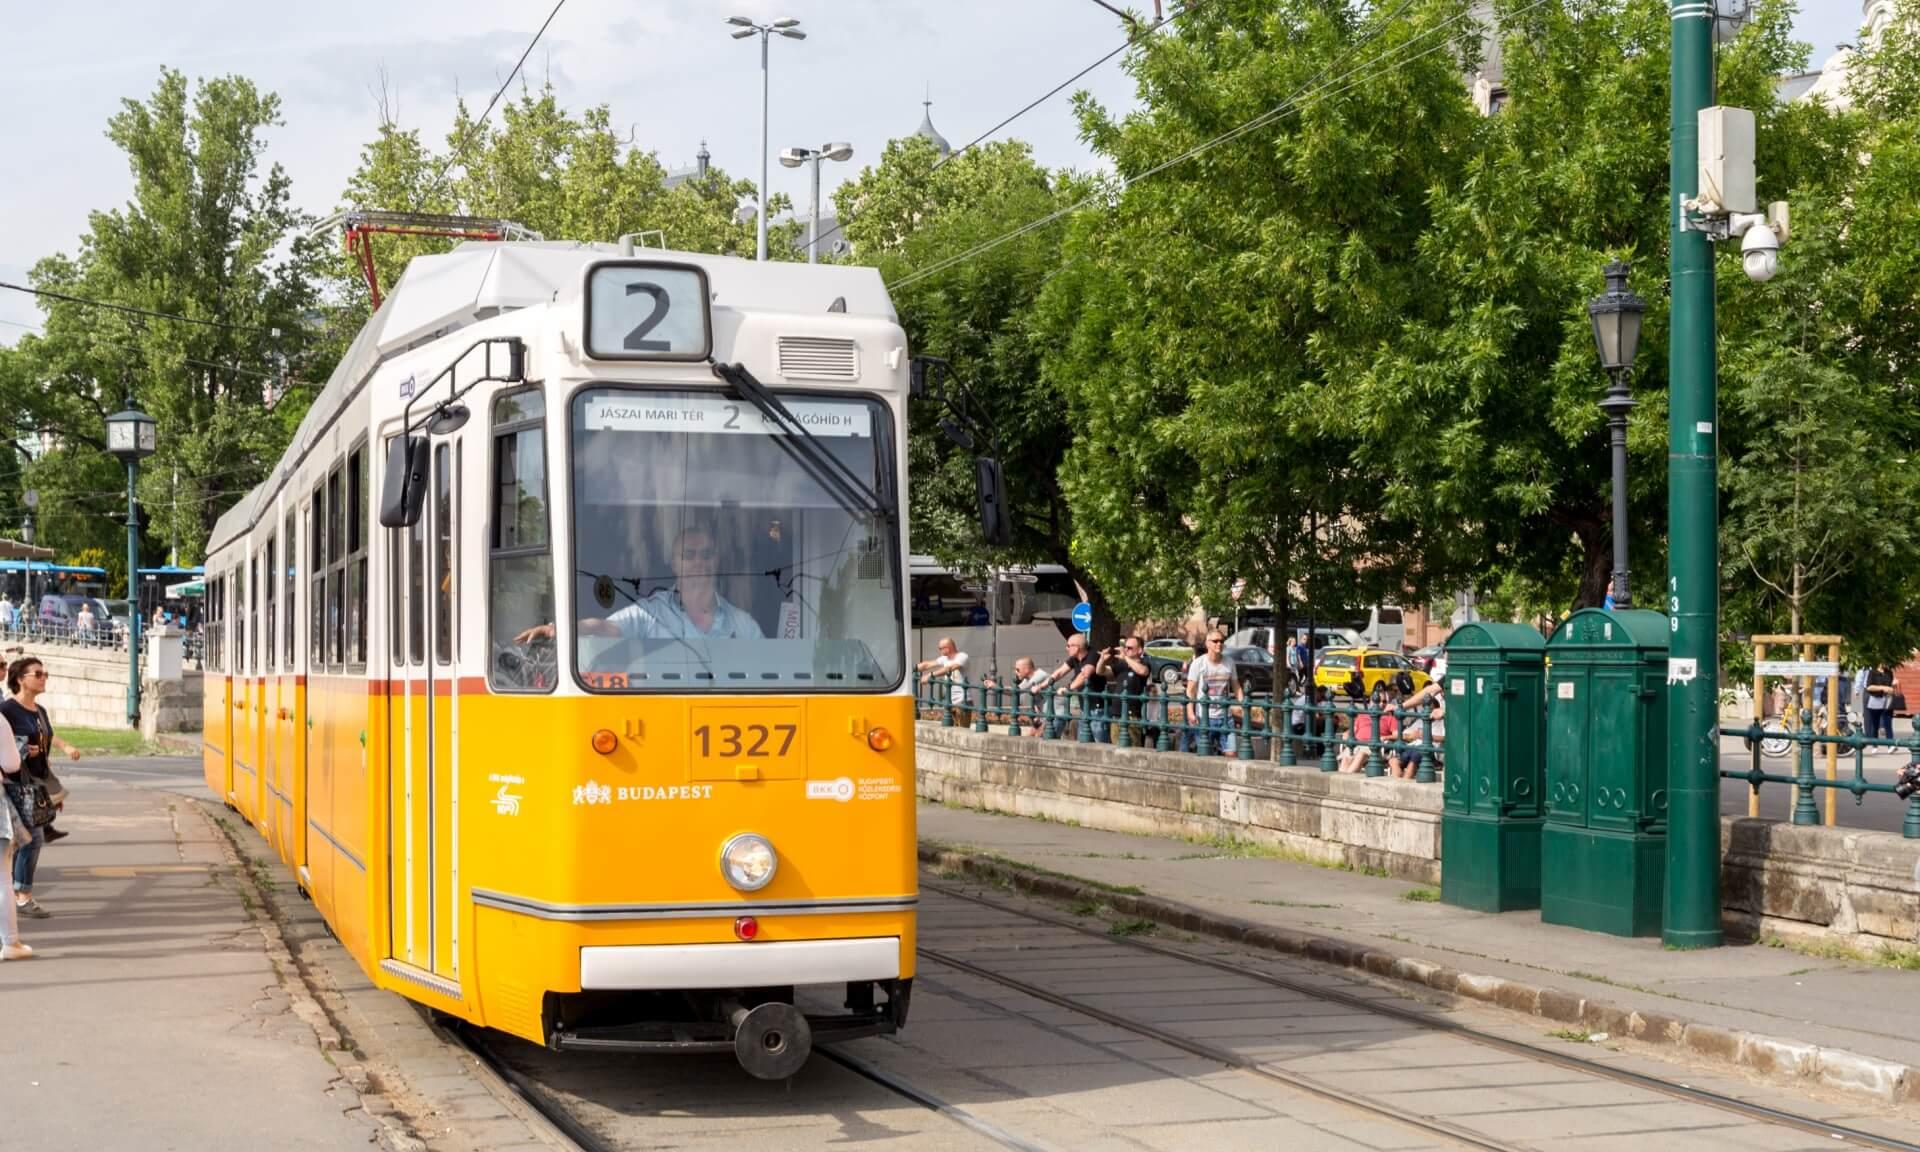 Tram 2 in Budapest